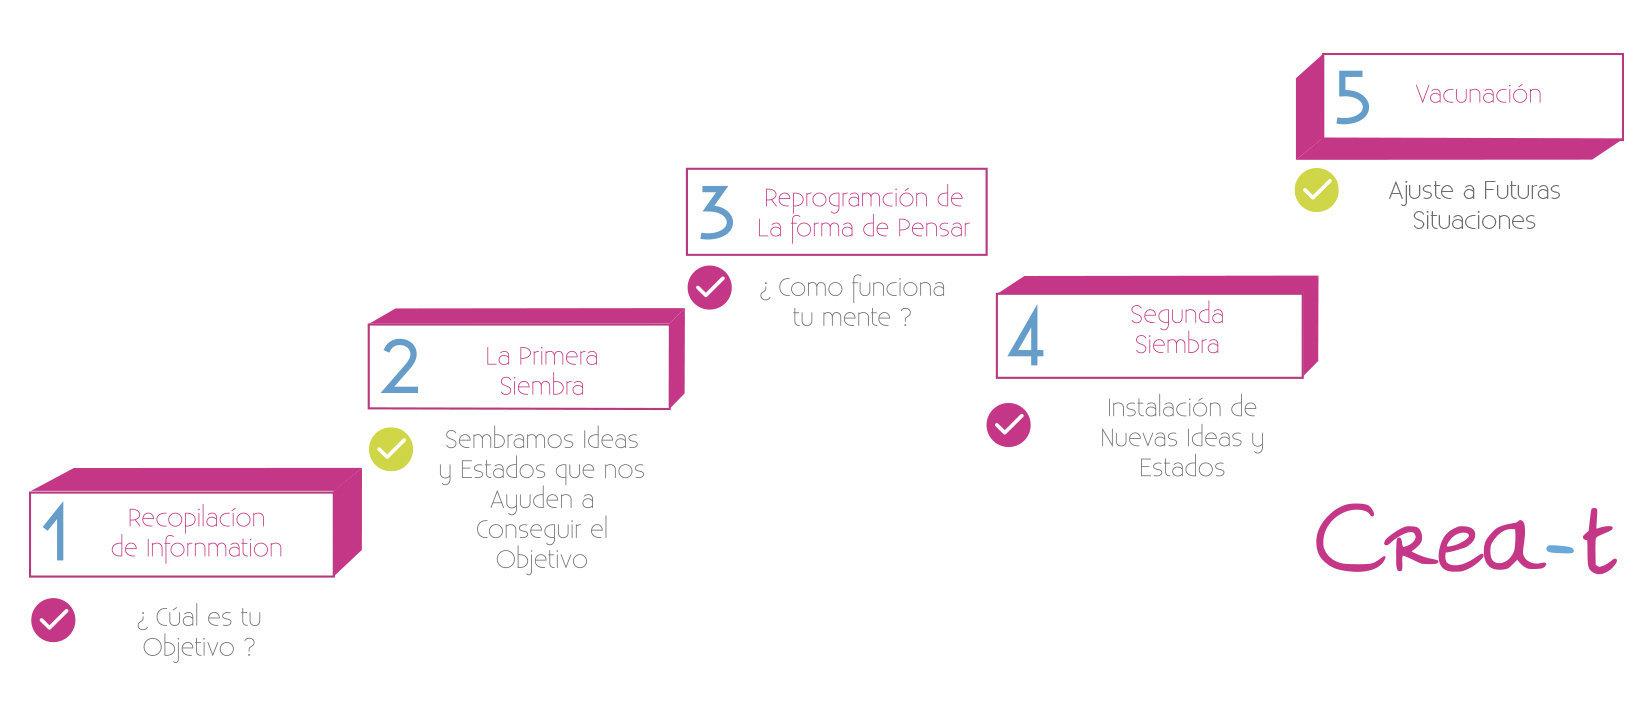 Modelo Integral De Cambio Personal Crea-t